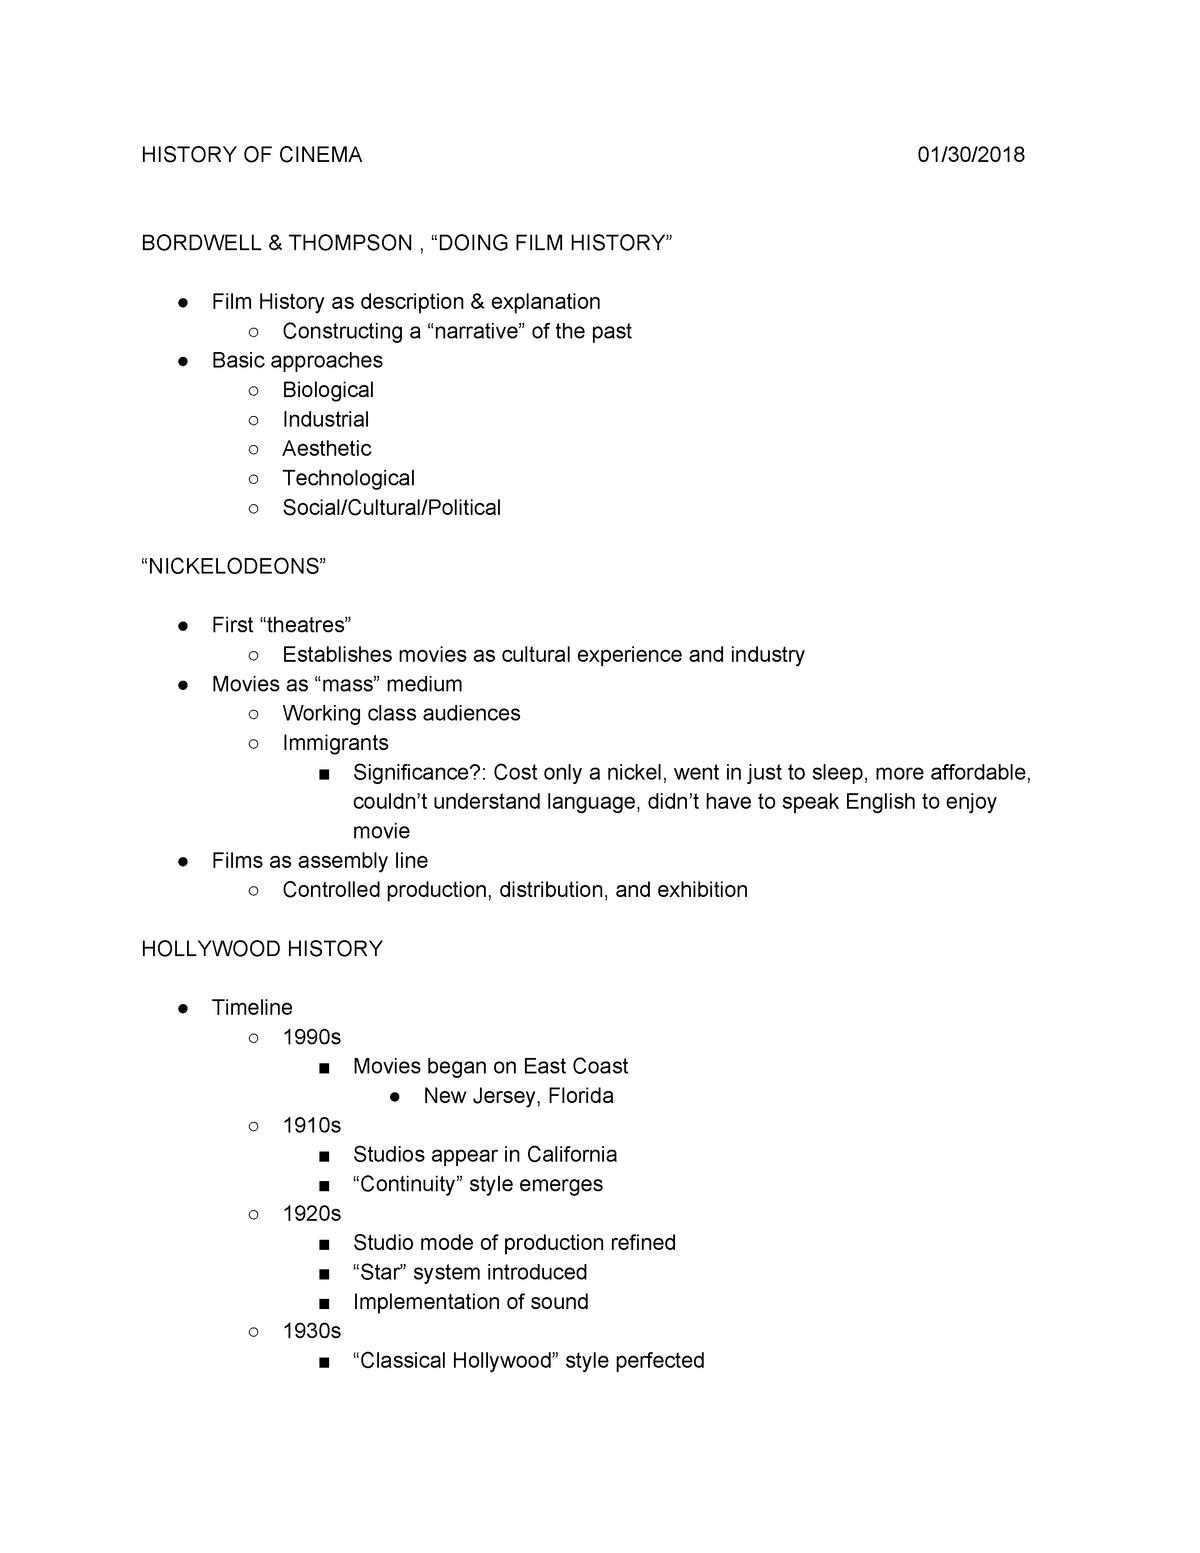 CMN 102 Notes - CMN 102: Introduction To Mass Communication